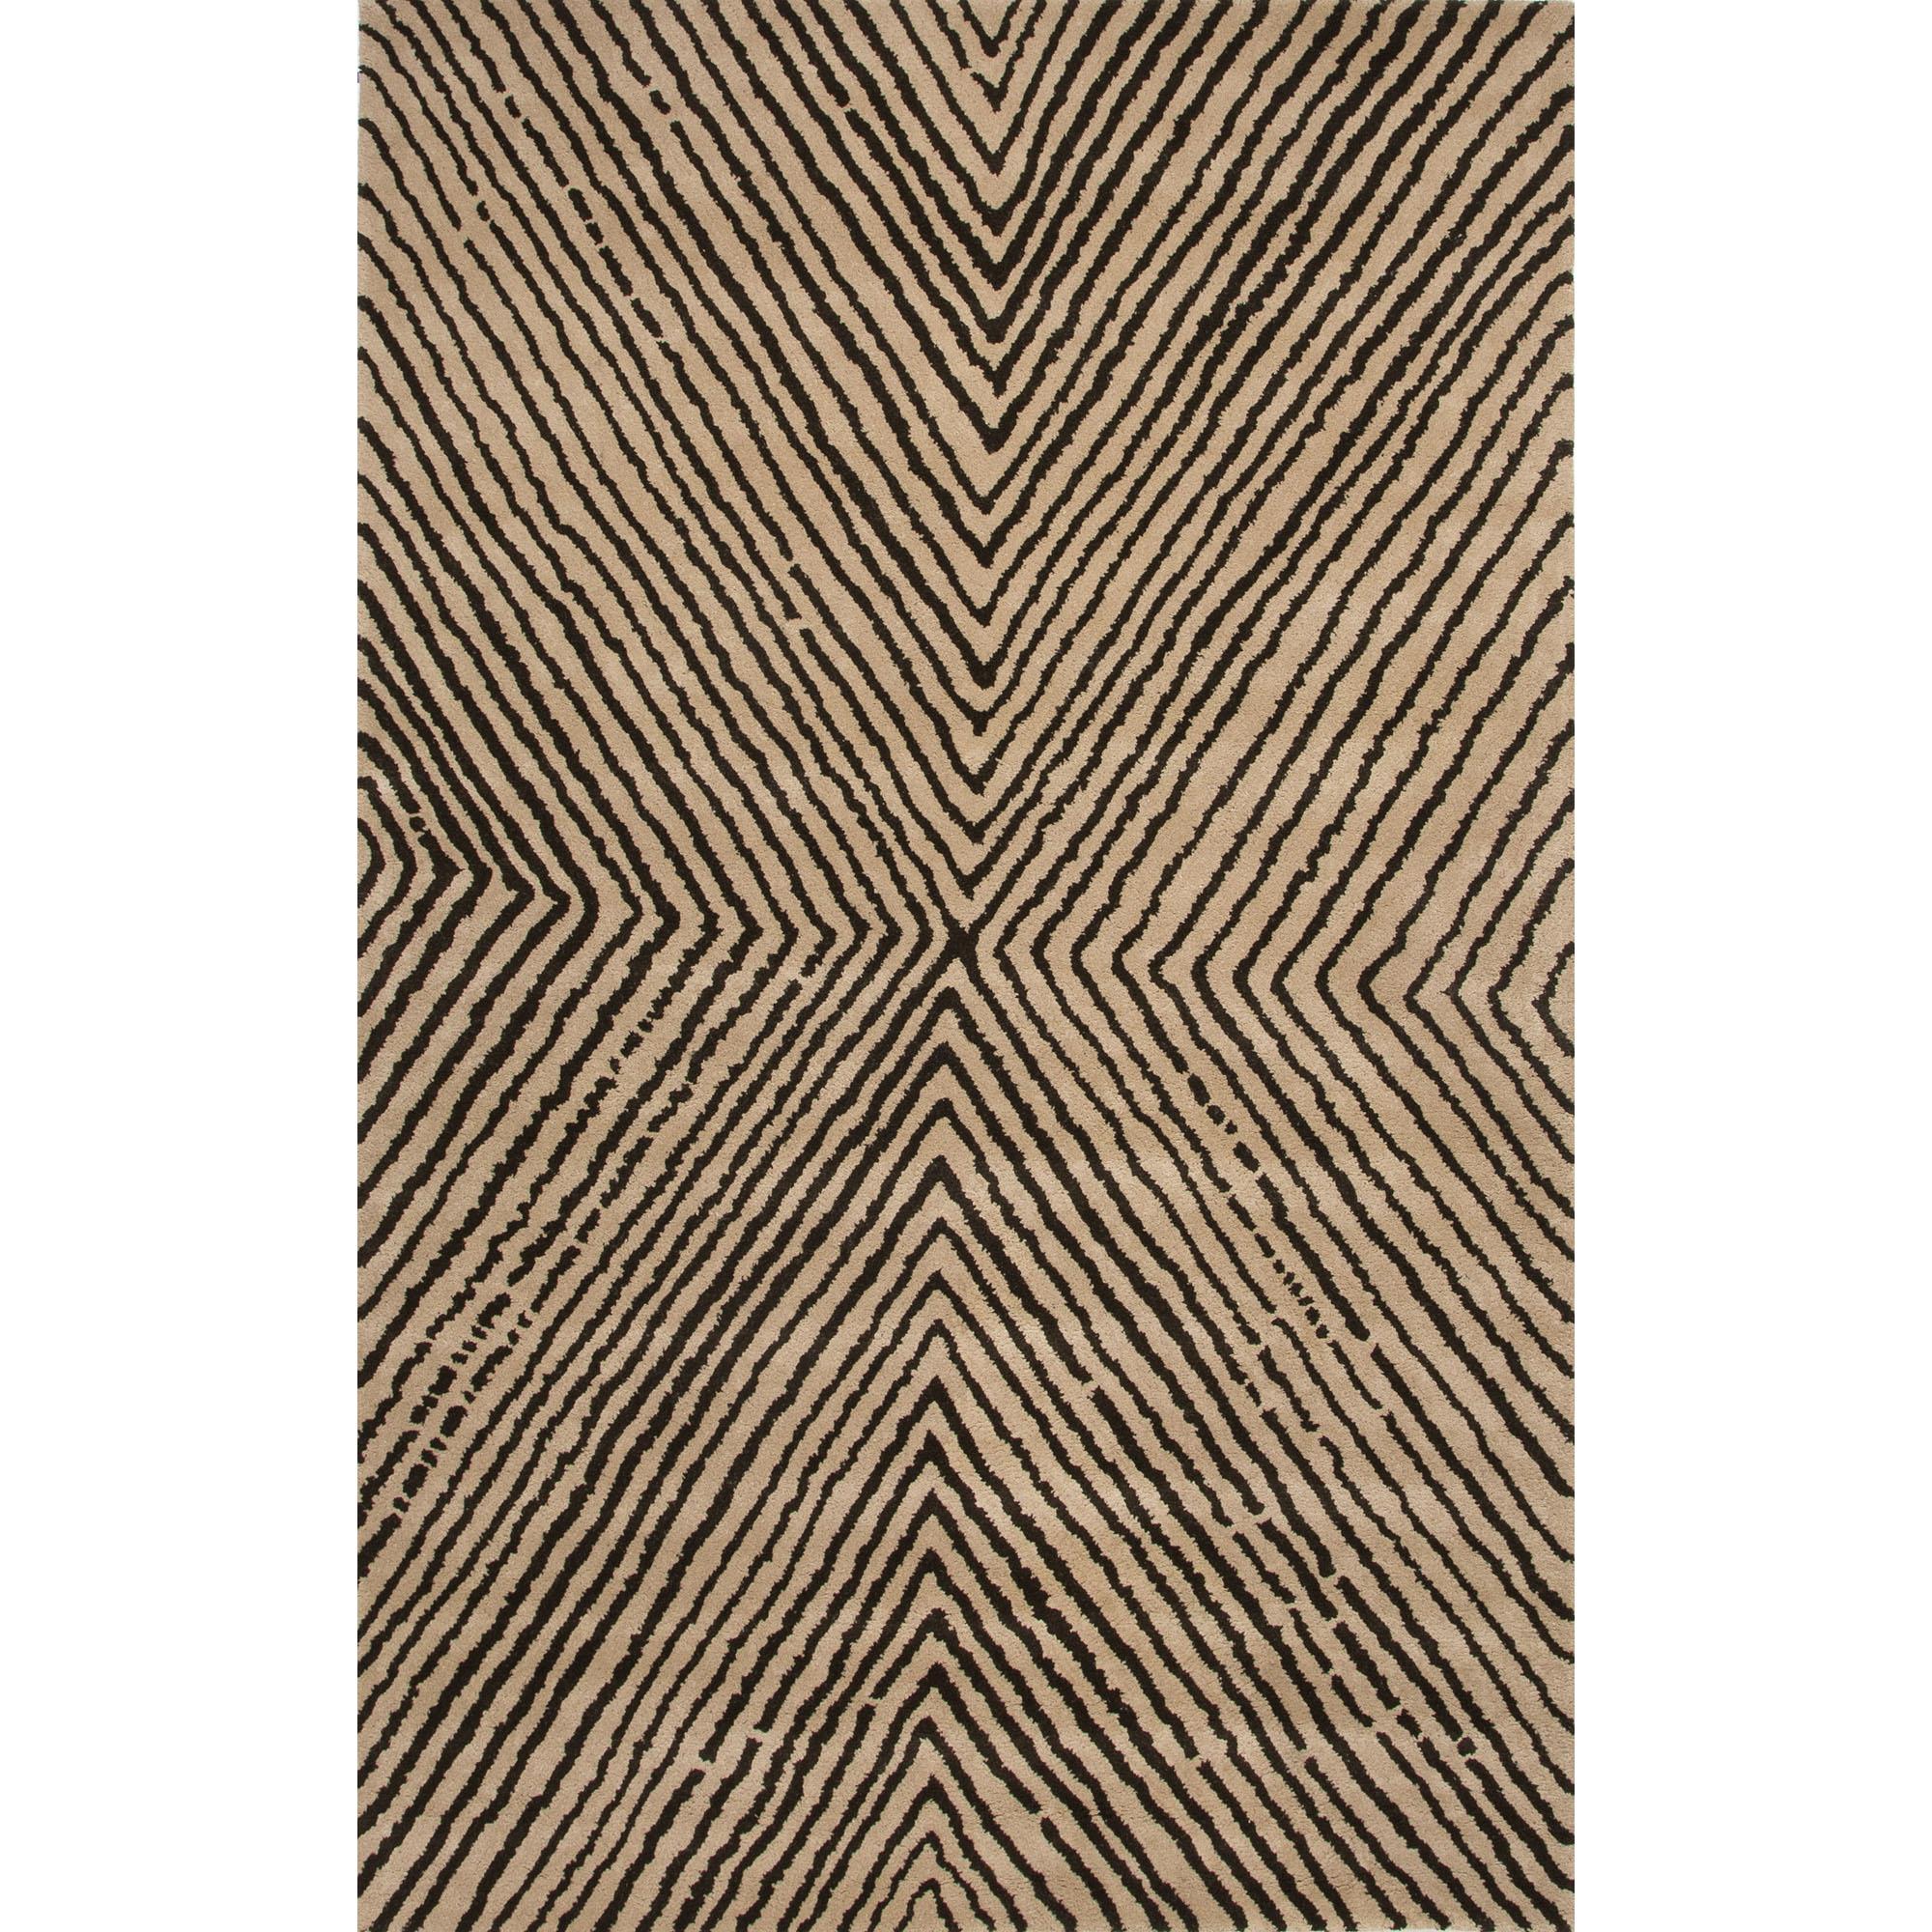 En Casa By Luli Sanchez Tufted 2 x 3 Rug by JAIPUR Living at Sprintz Furniture